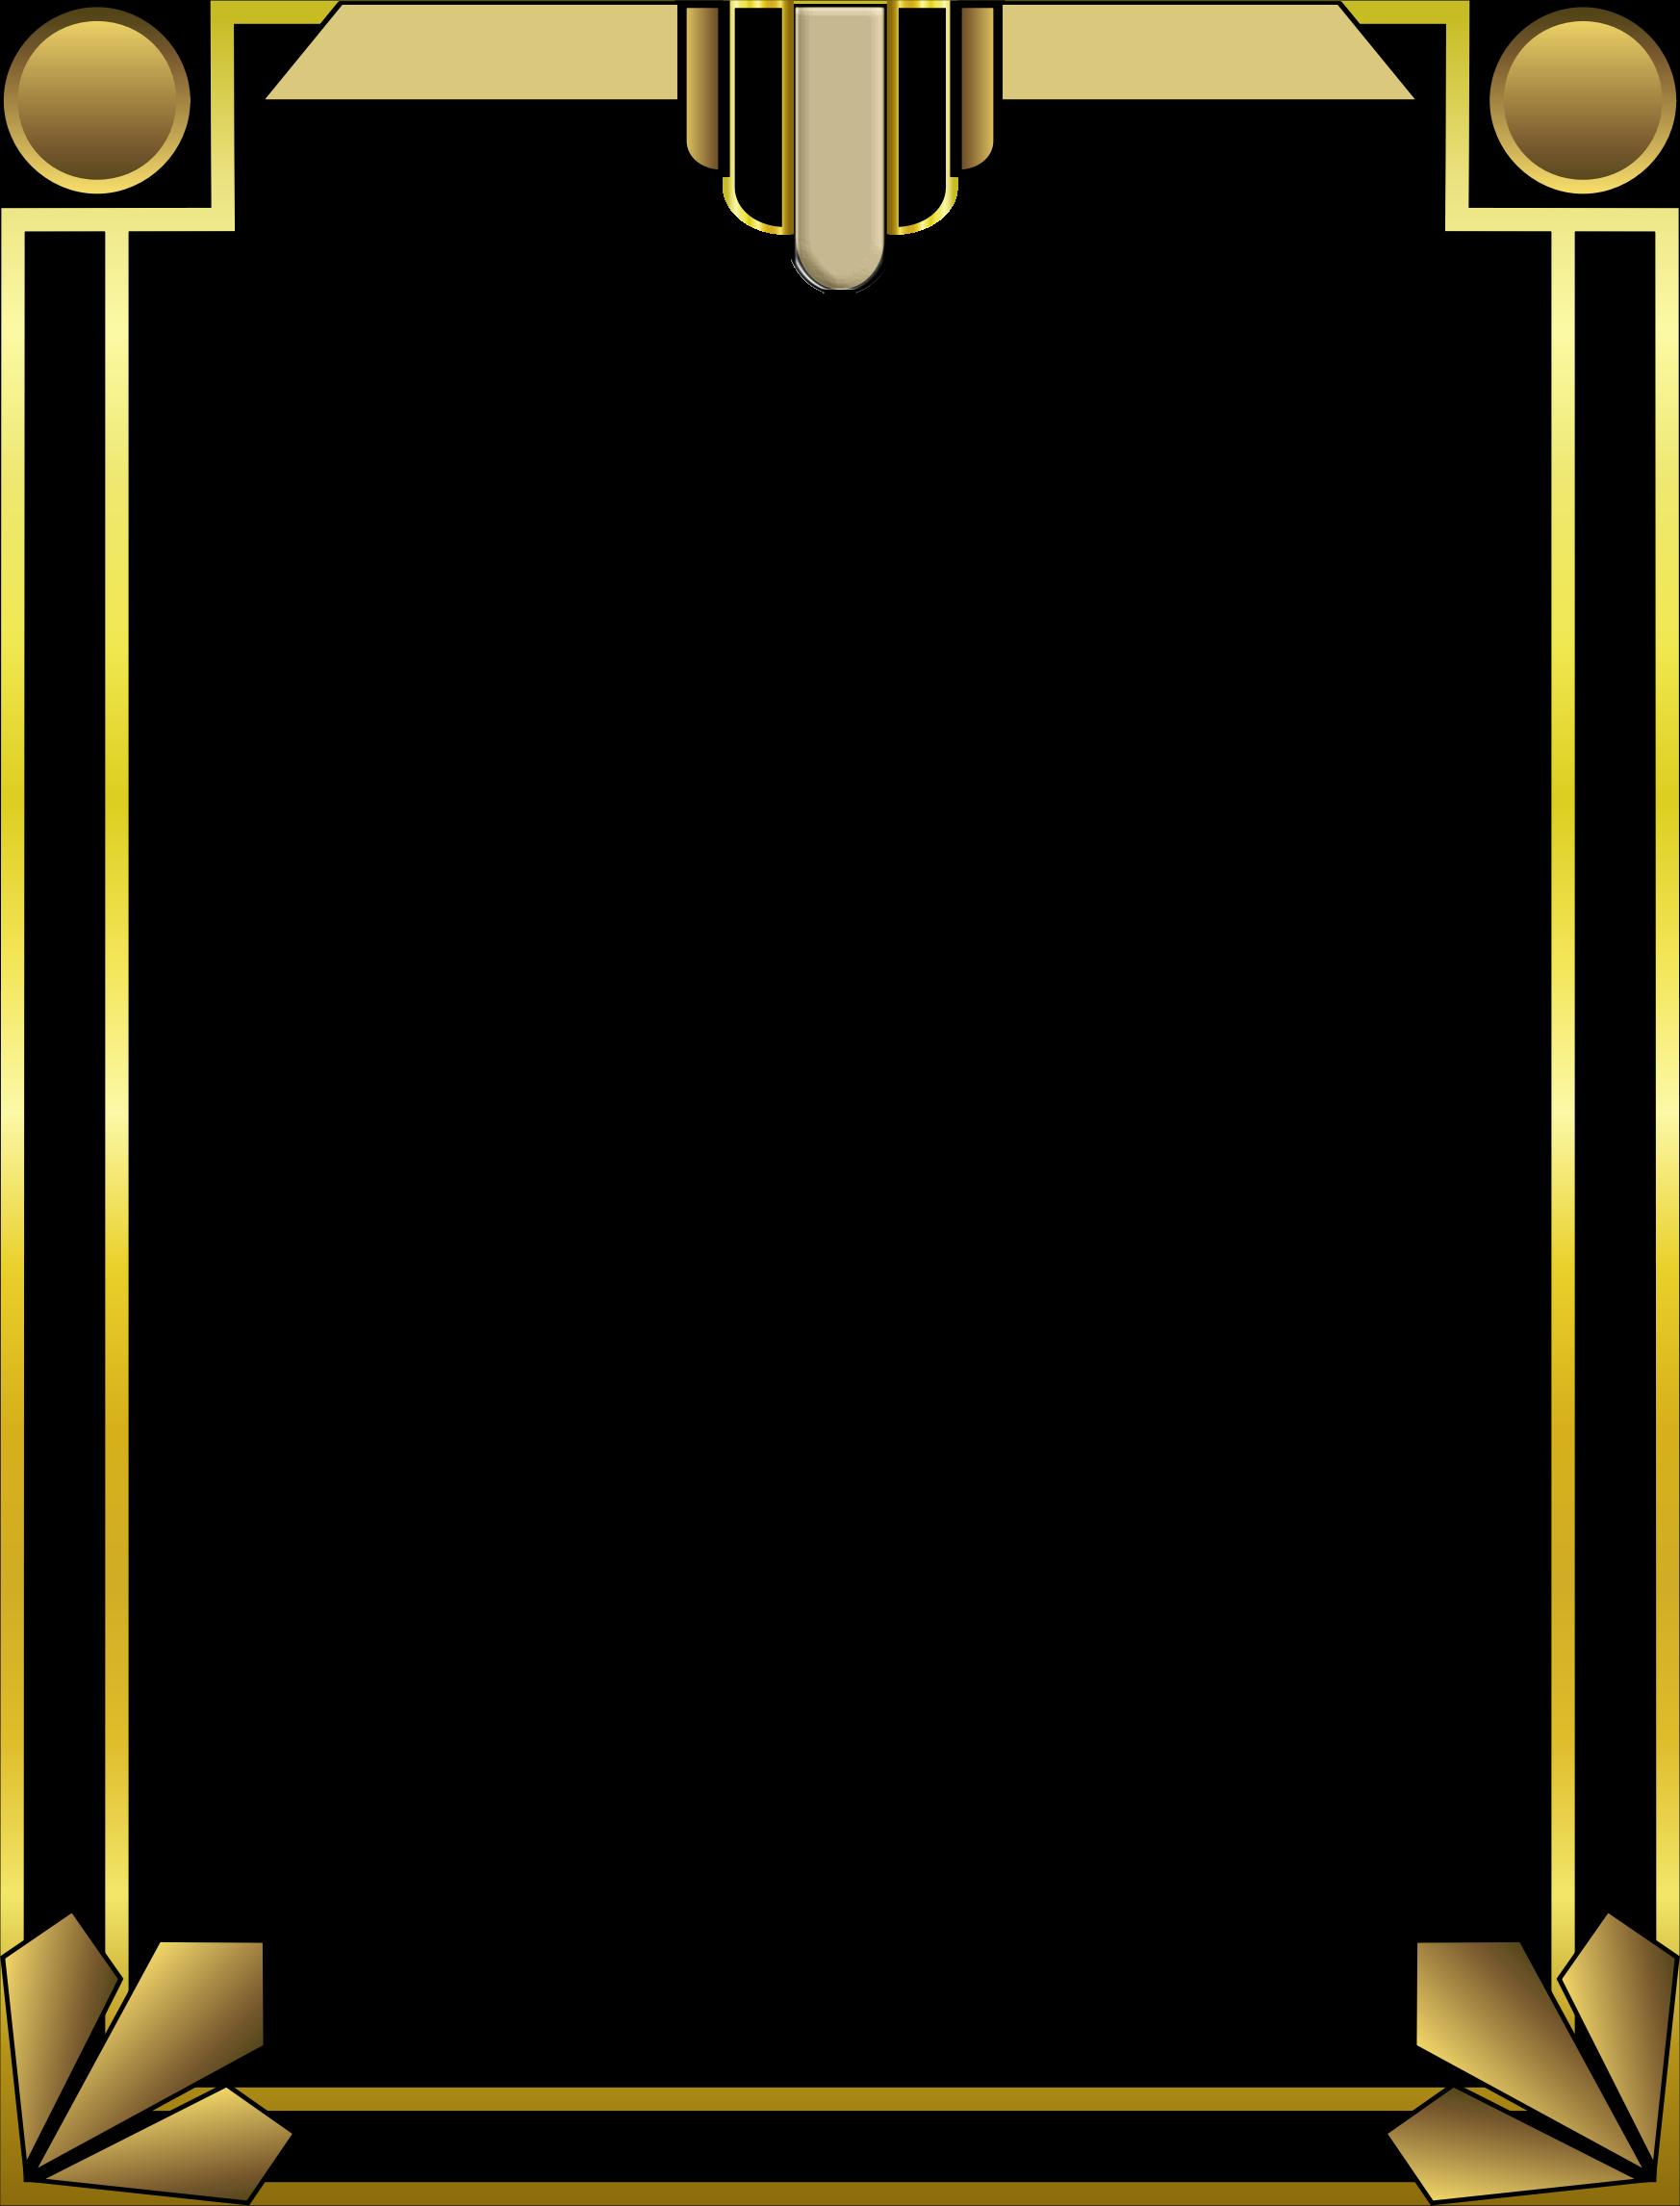 Clipart frames art deco. Border by arvin r